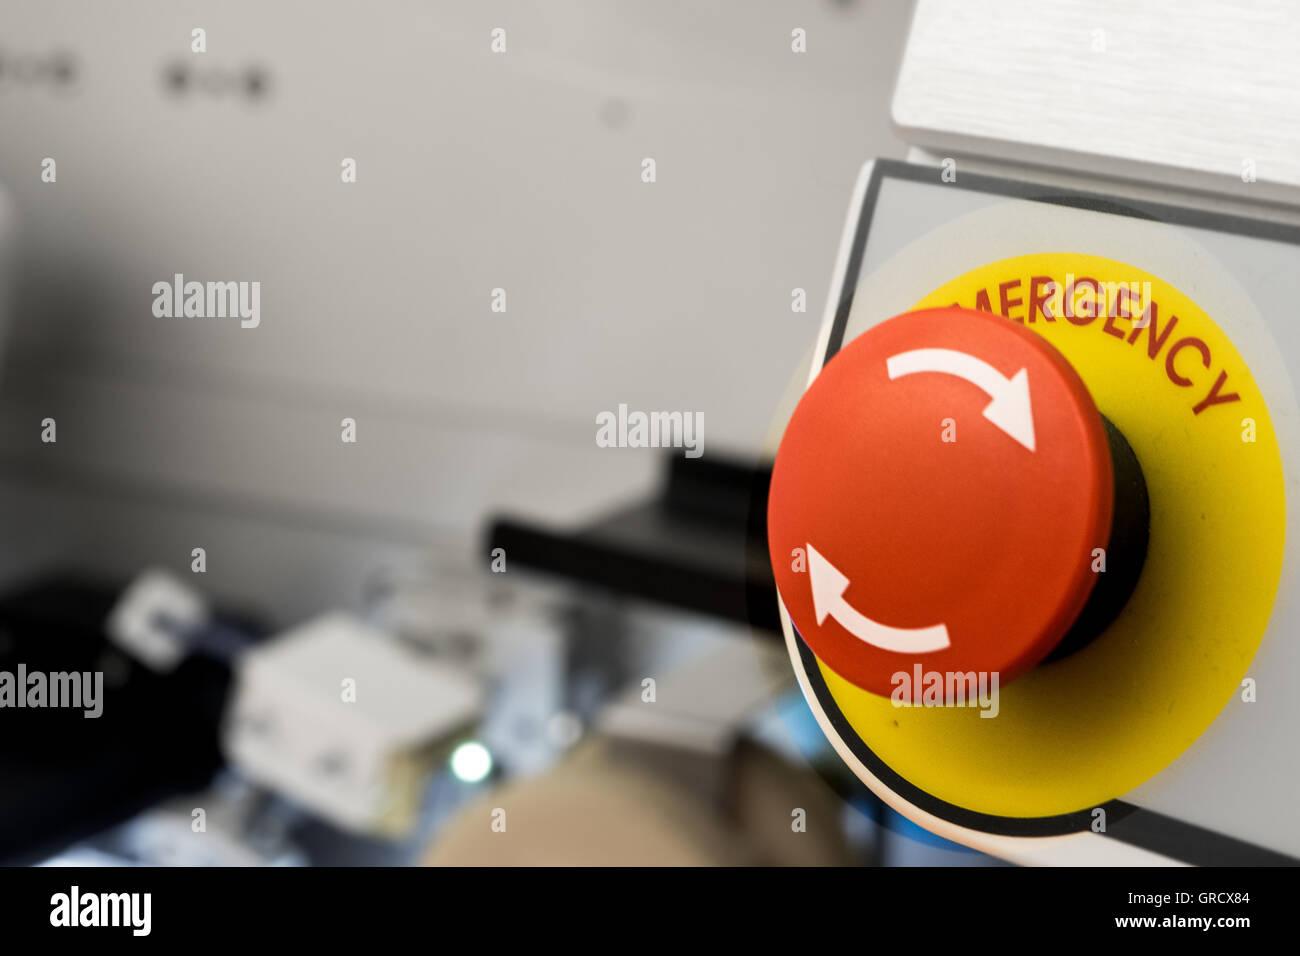 Emergency Panic Button - Stock Image